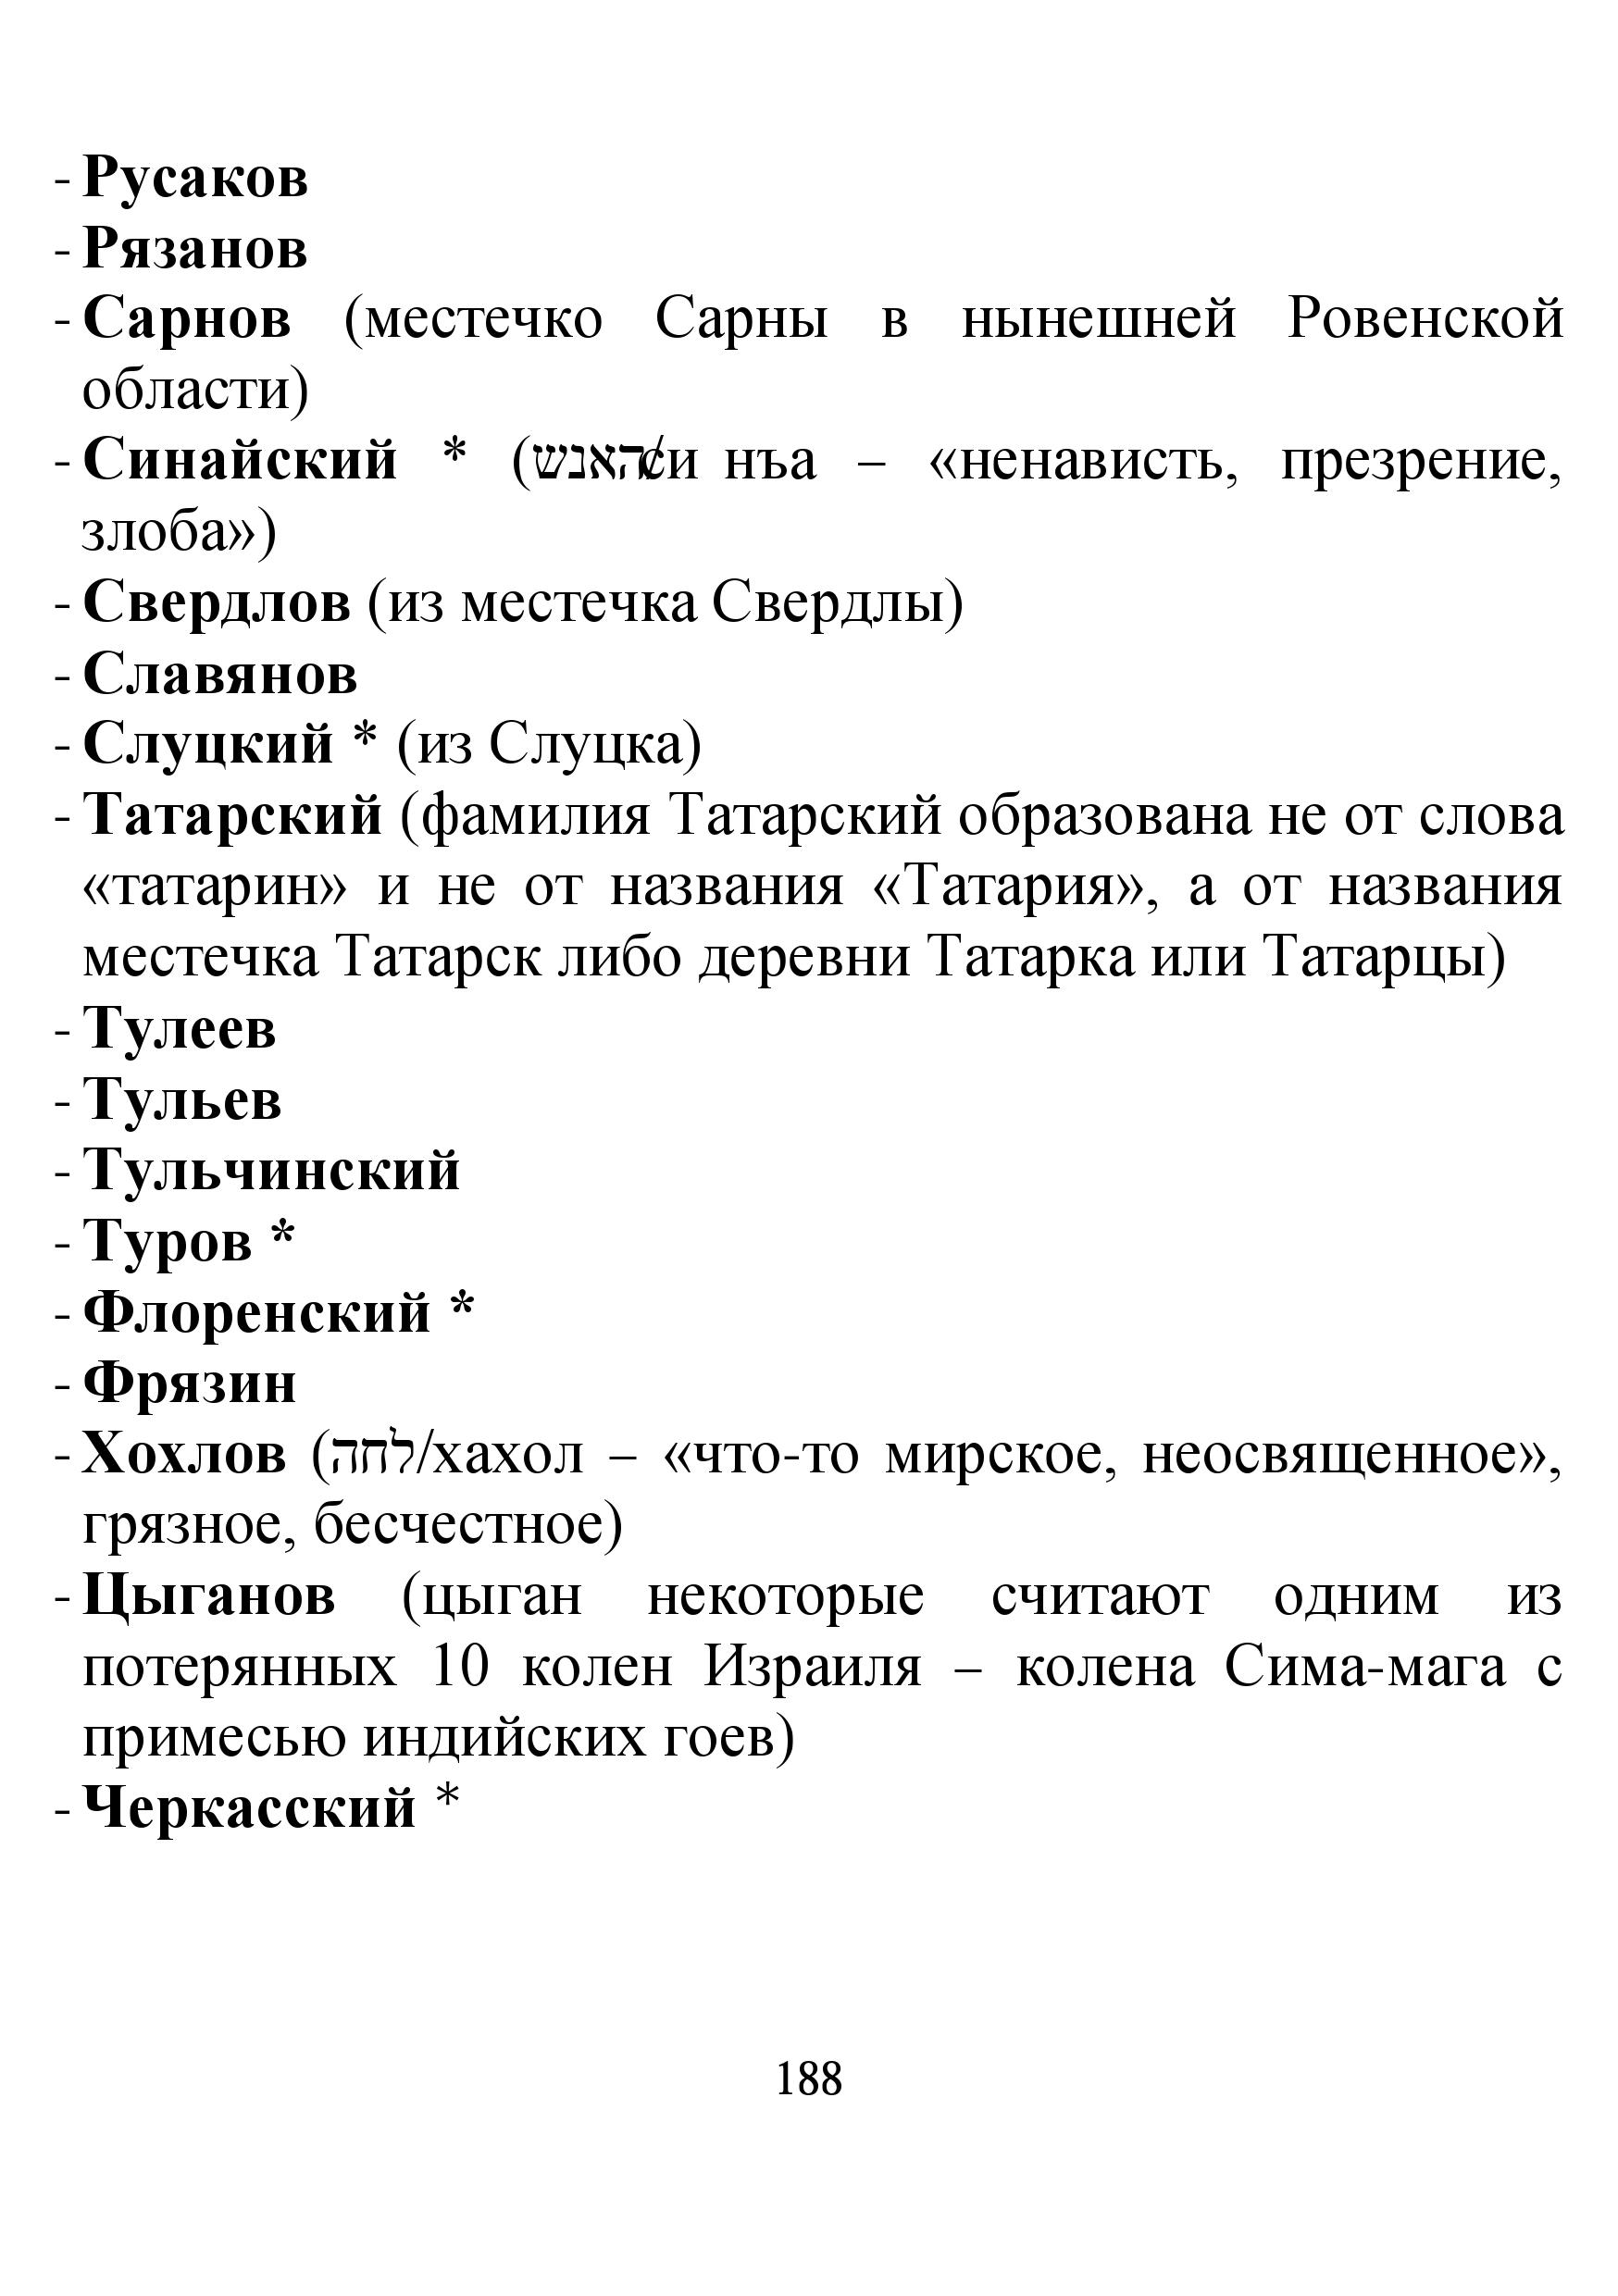 http://s4.uploads.ru/ZCyLW.jpg